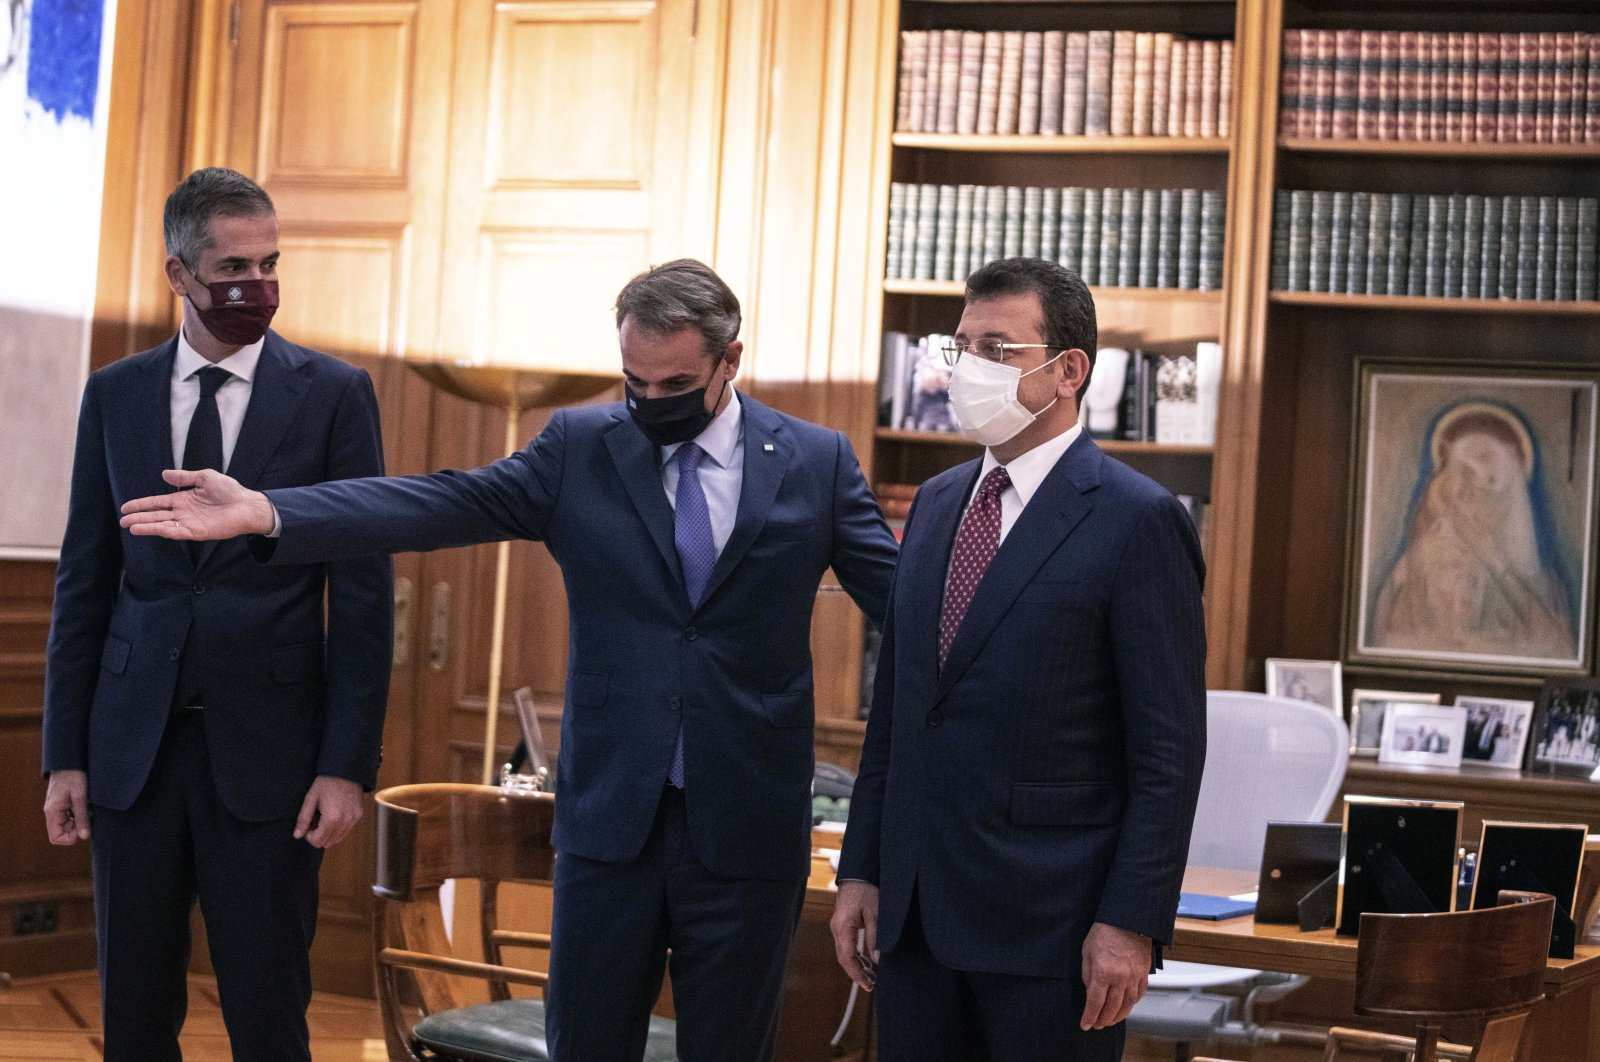 Greek Prime Minister Kyriakos Mitsotakis (C) welcomes the Mayor of Istanbul Ekrem Imamoğlu (R) and Mayor of Athens Kostas Bakoyannis, during their meeting in Athens, Greece, Sept. 21, 2021. (AP Photo)